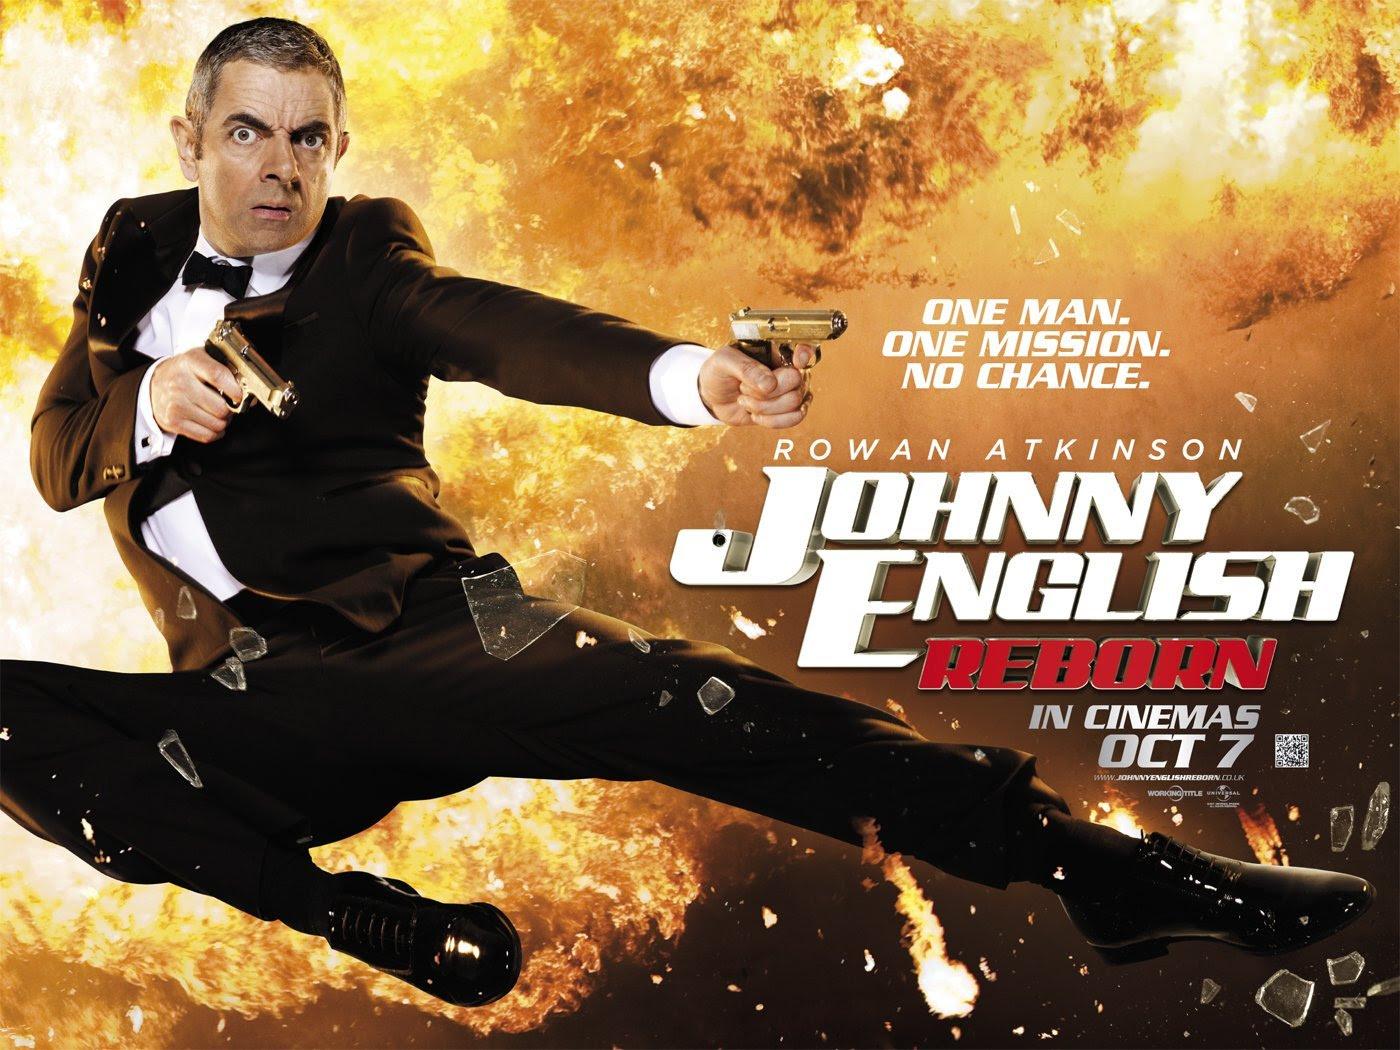 Movie Posters! images Johnny English Reborn\u2665 HD wallpaper